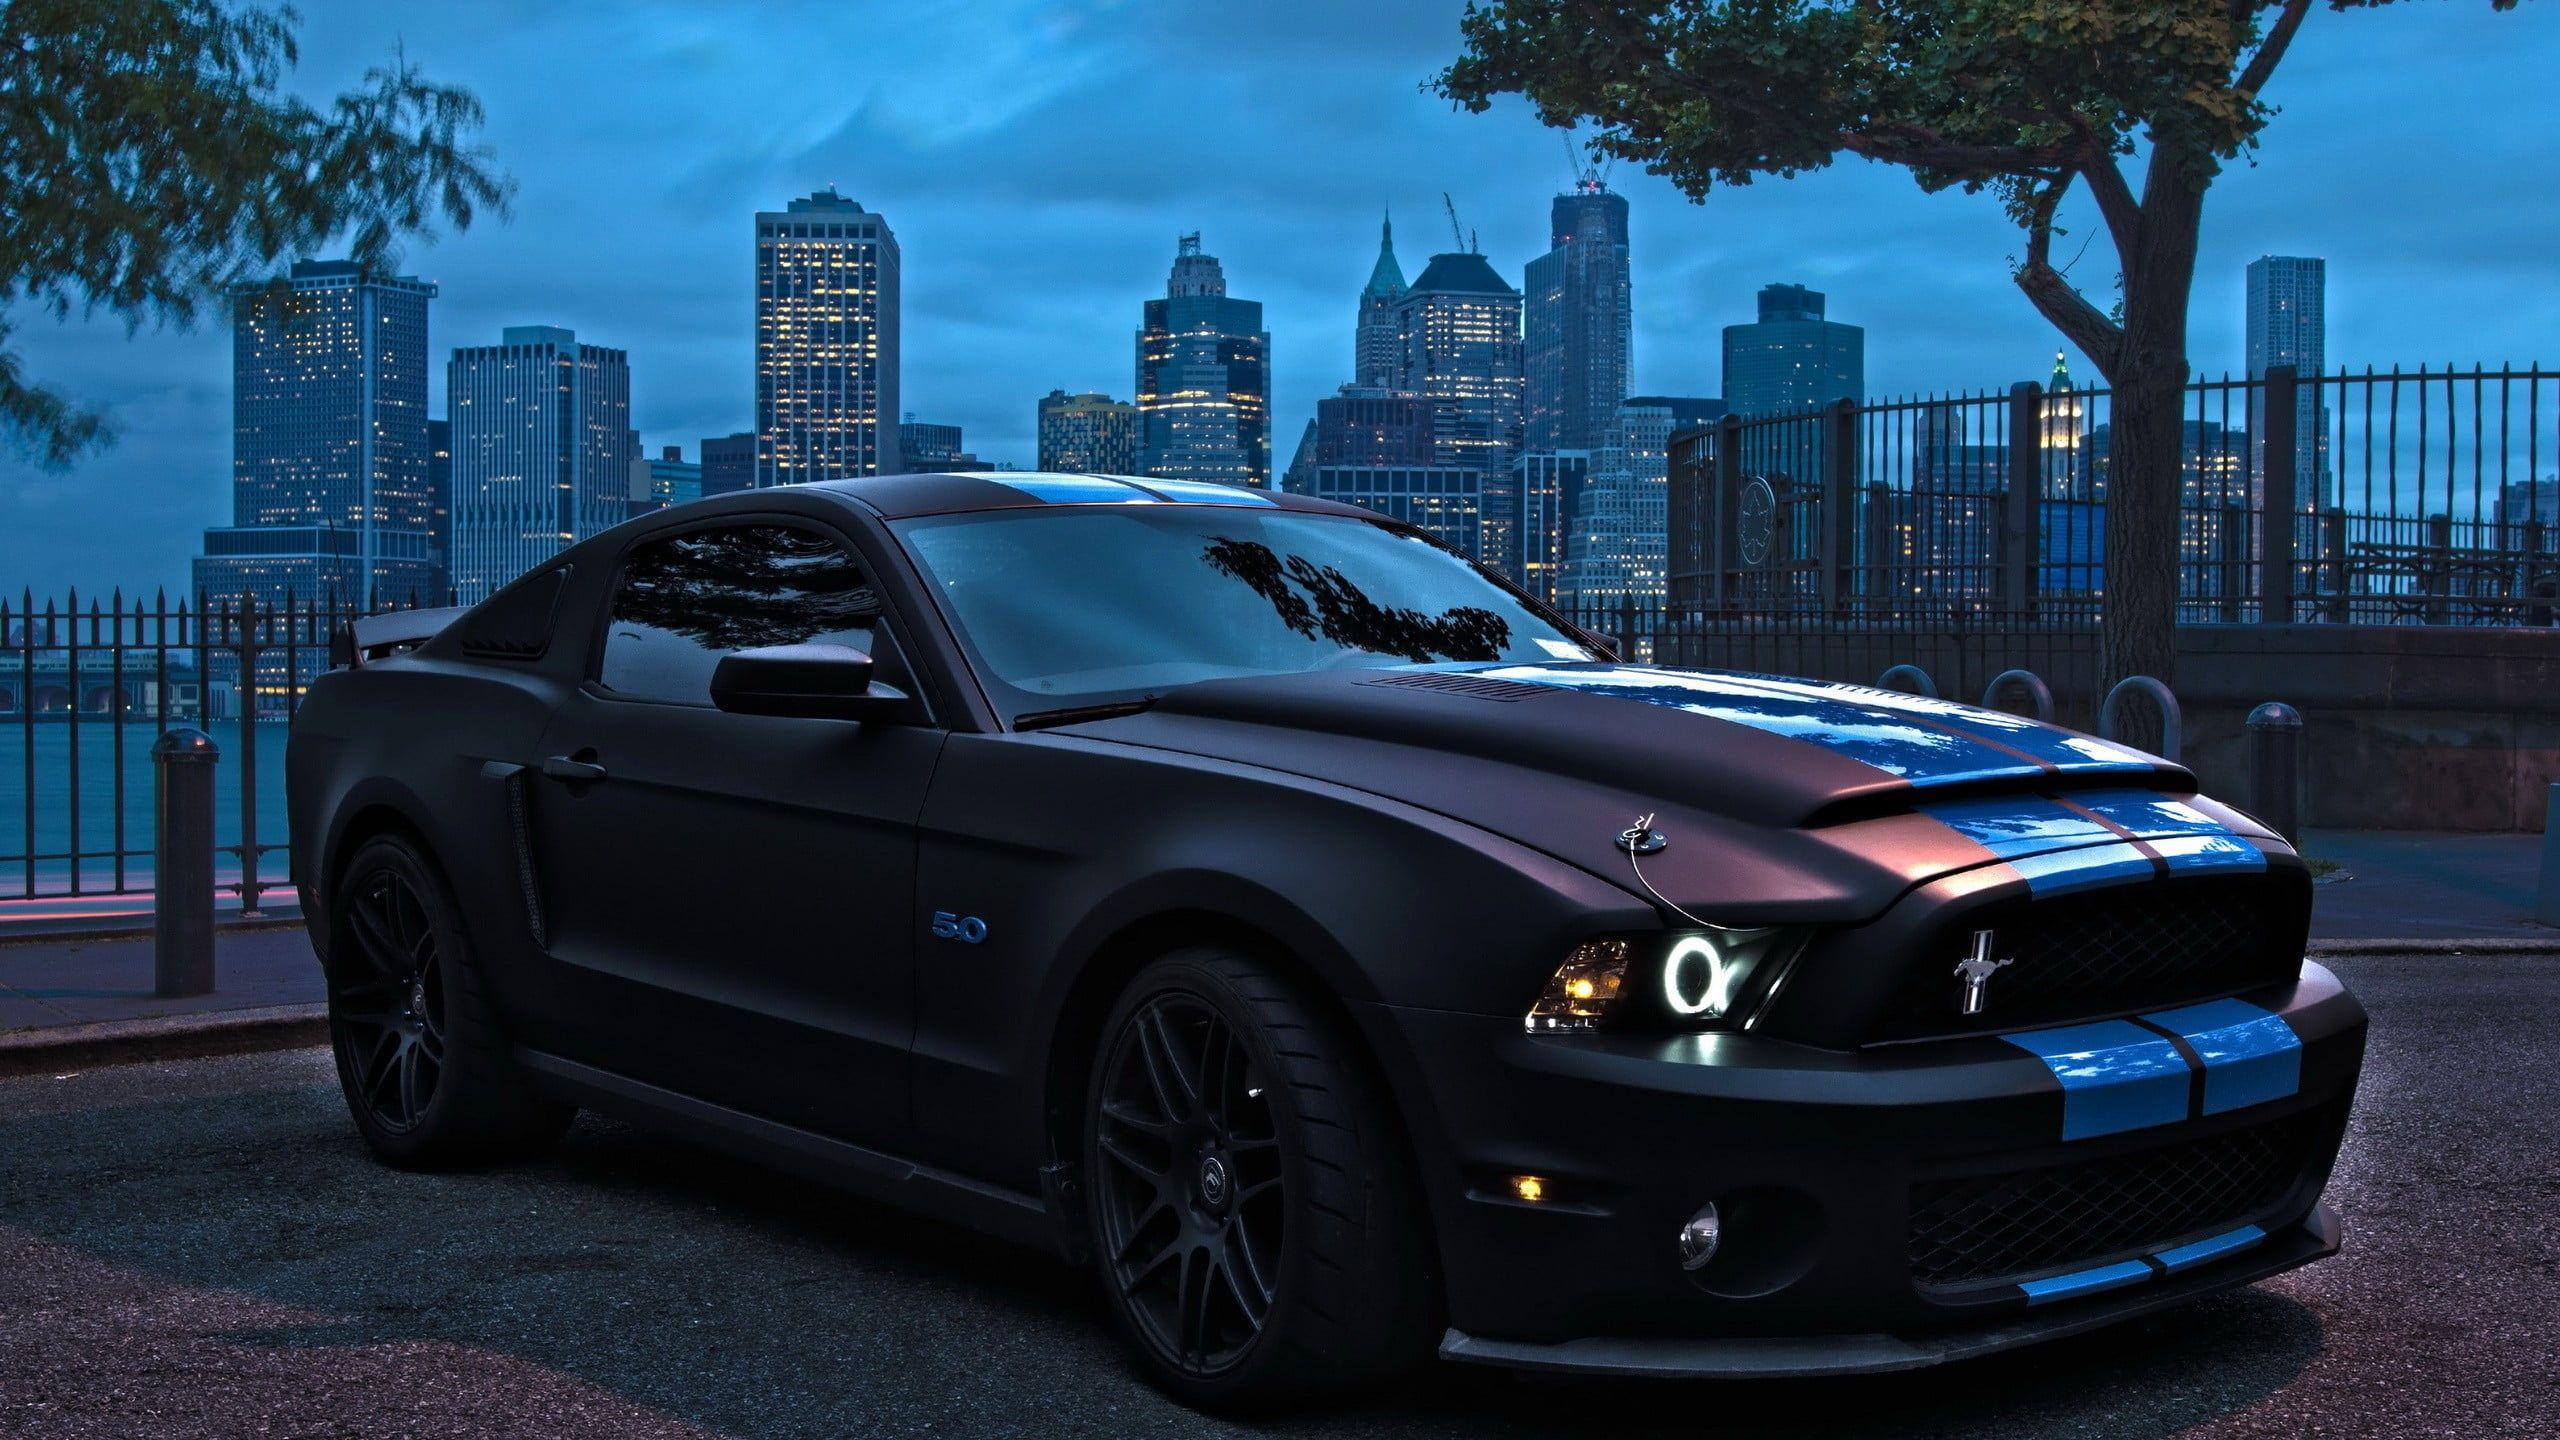 Black Ford Mustang Ford Mustang Car Muscle Cars 2k Wallpaper Hdwallpaper Desktop Tapeten Ideen Tapeten Auto Hintergrunde